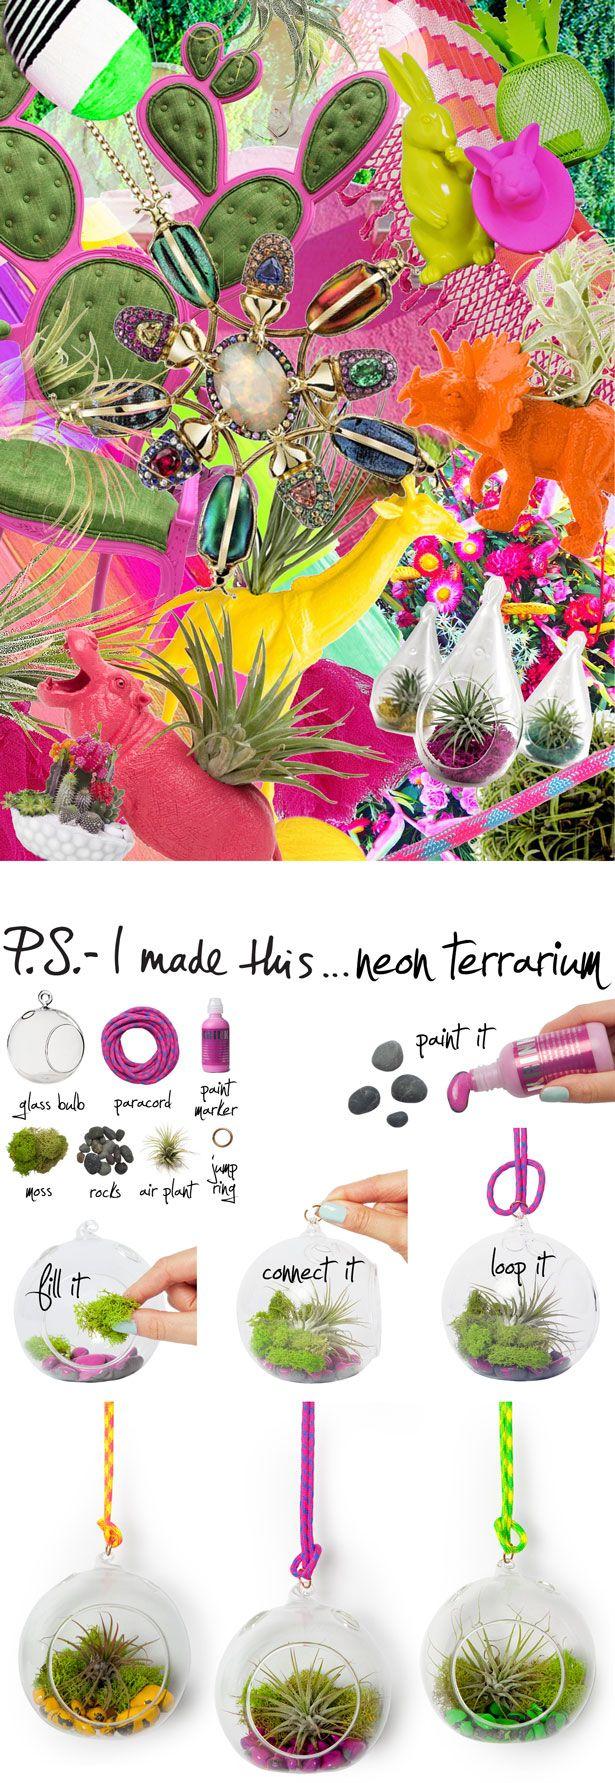 P.S.-I made this...Neon Terrarium  #PSIMADETHIS #DIY @MakersKit - DIY Project Kits